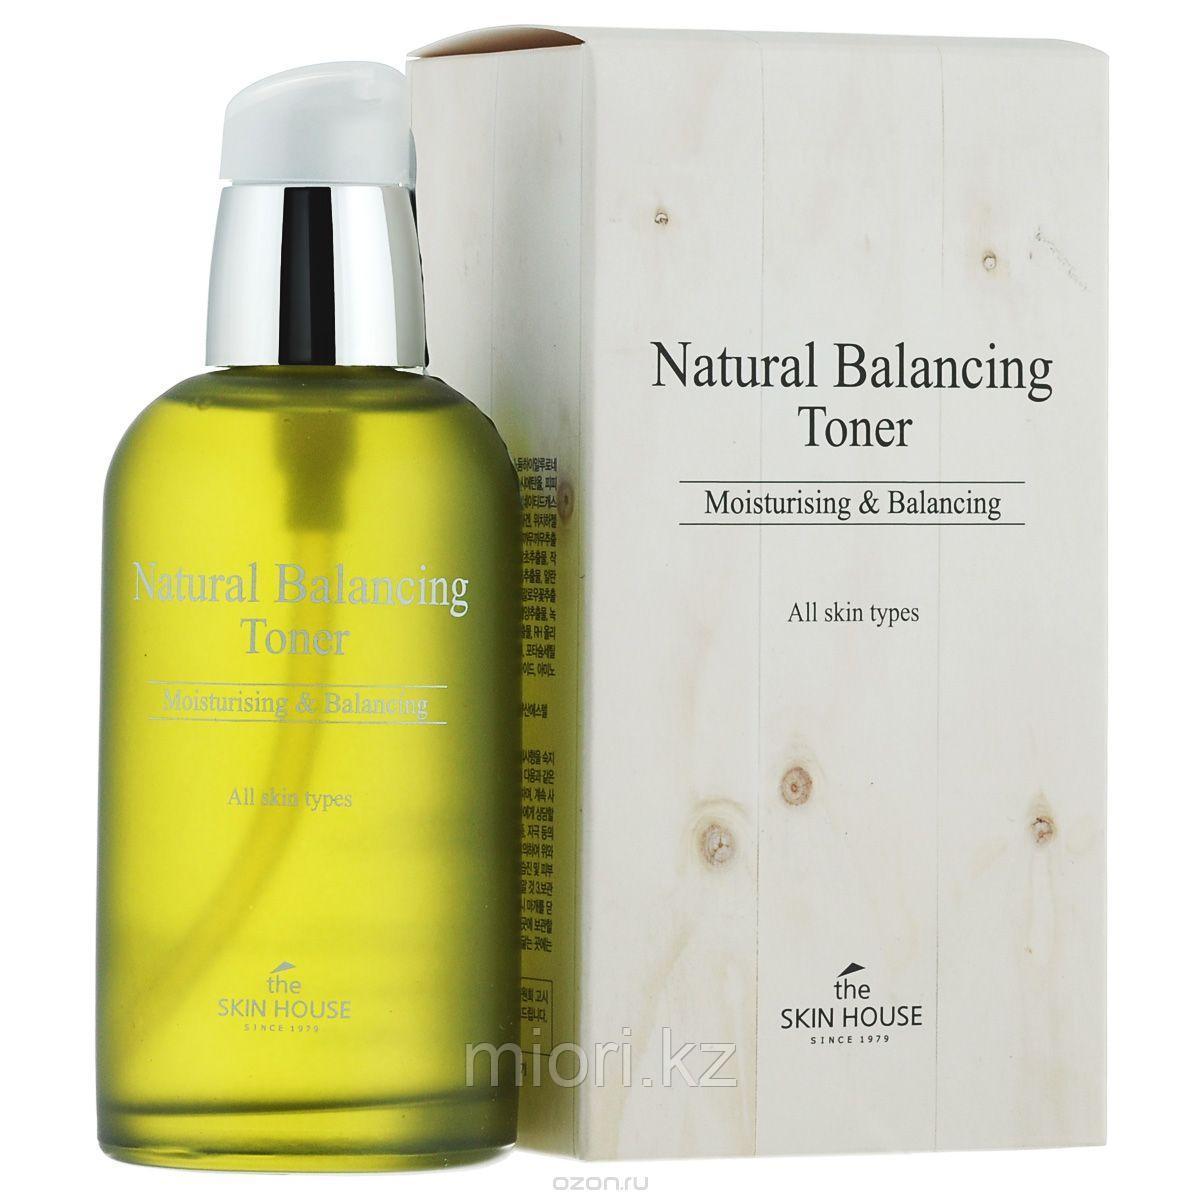 Увлажняющий и балансируюший тоник The Skin House Natural Balancing Toner,130мл